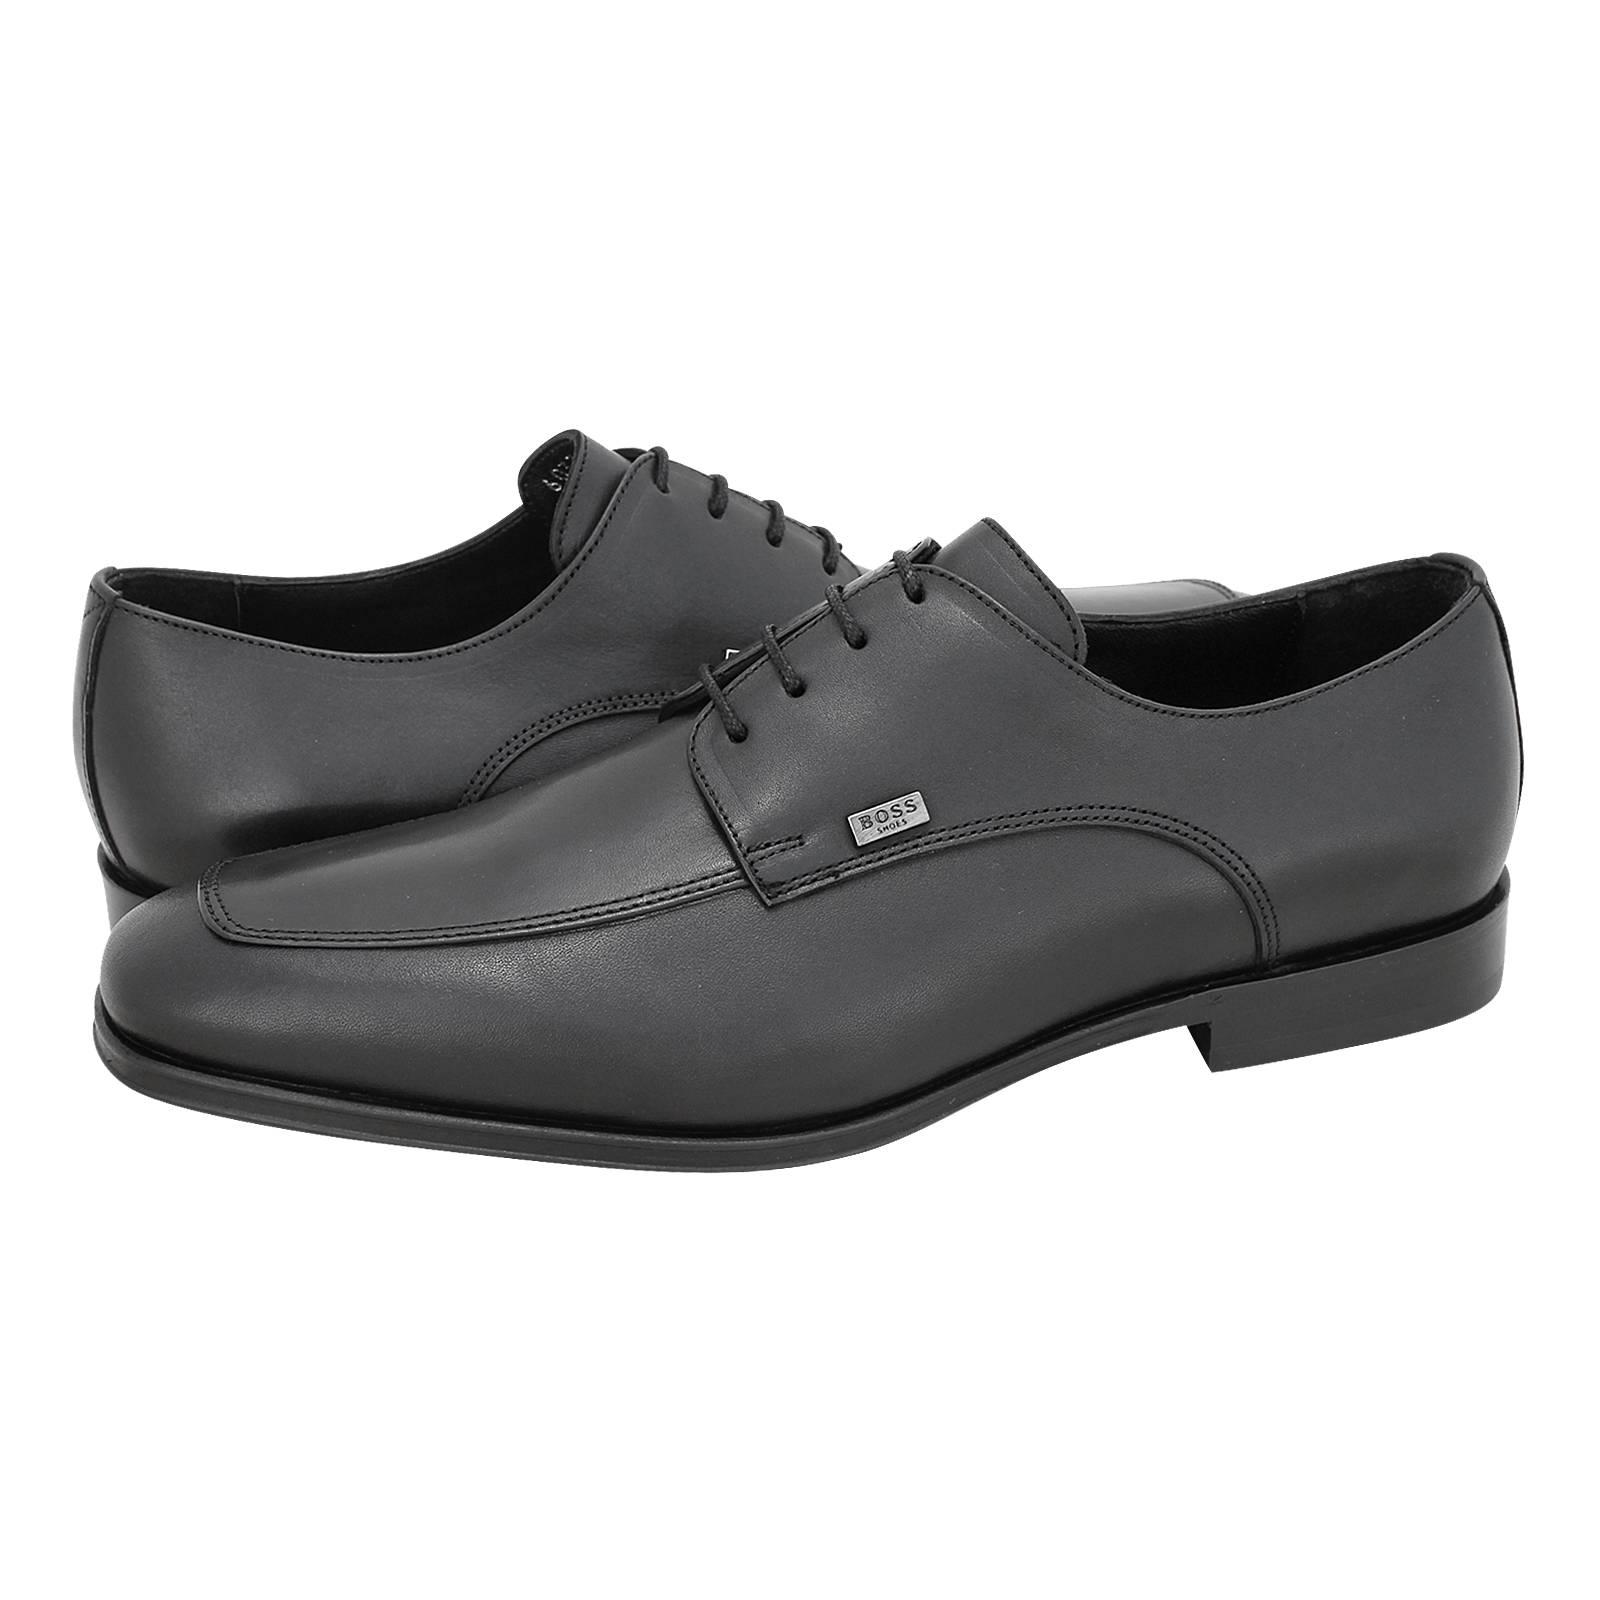 2ceabac0f9f Seixal - Ανδρικά δετά παπούτσια Boss από δέρμα - Gianna Kazakou Online